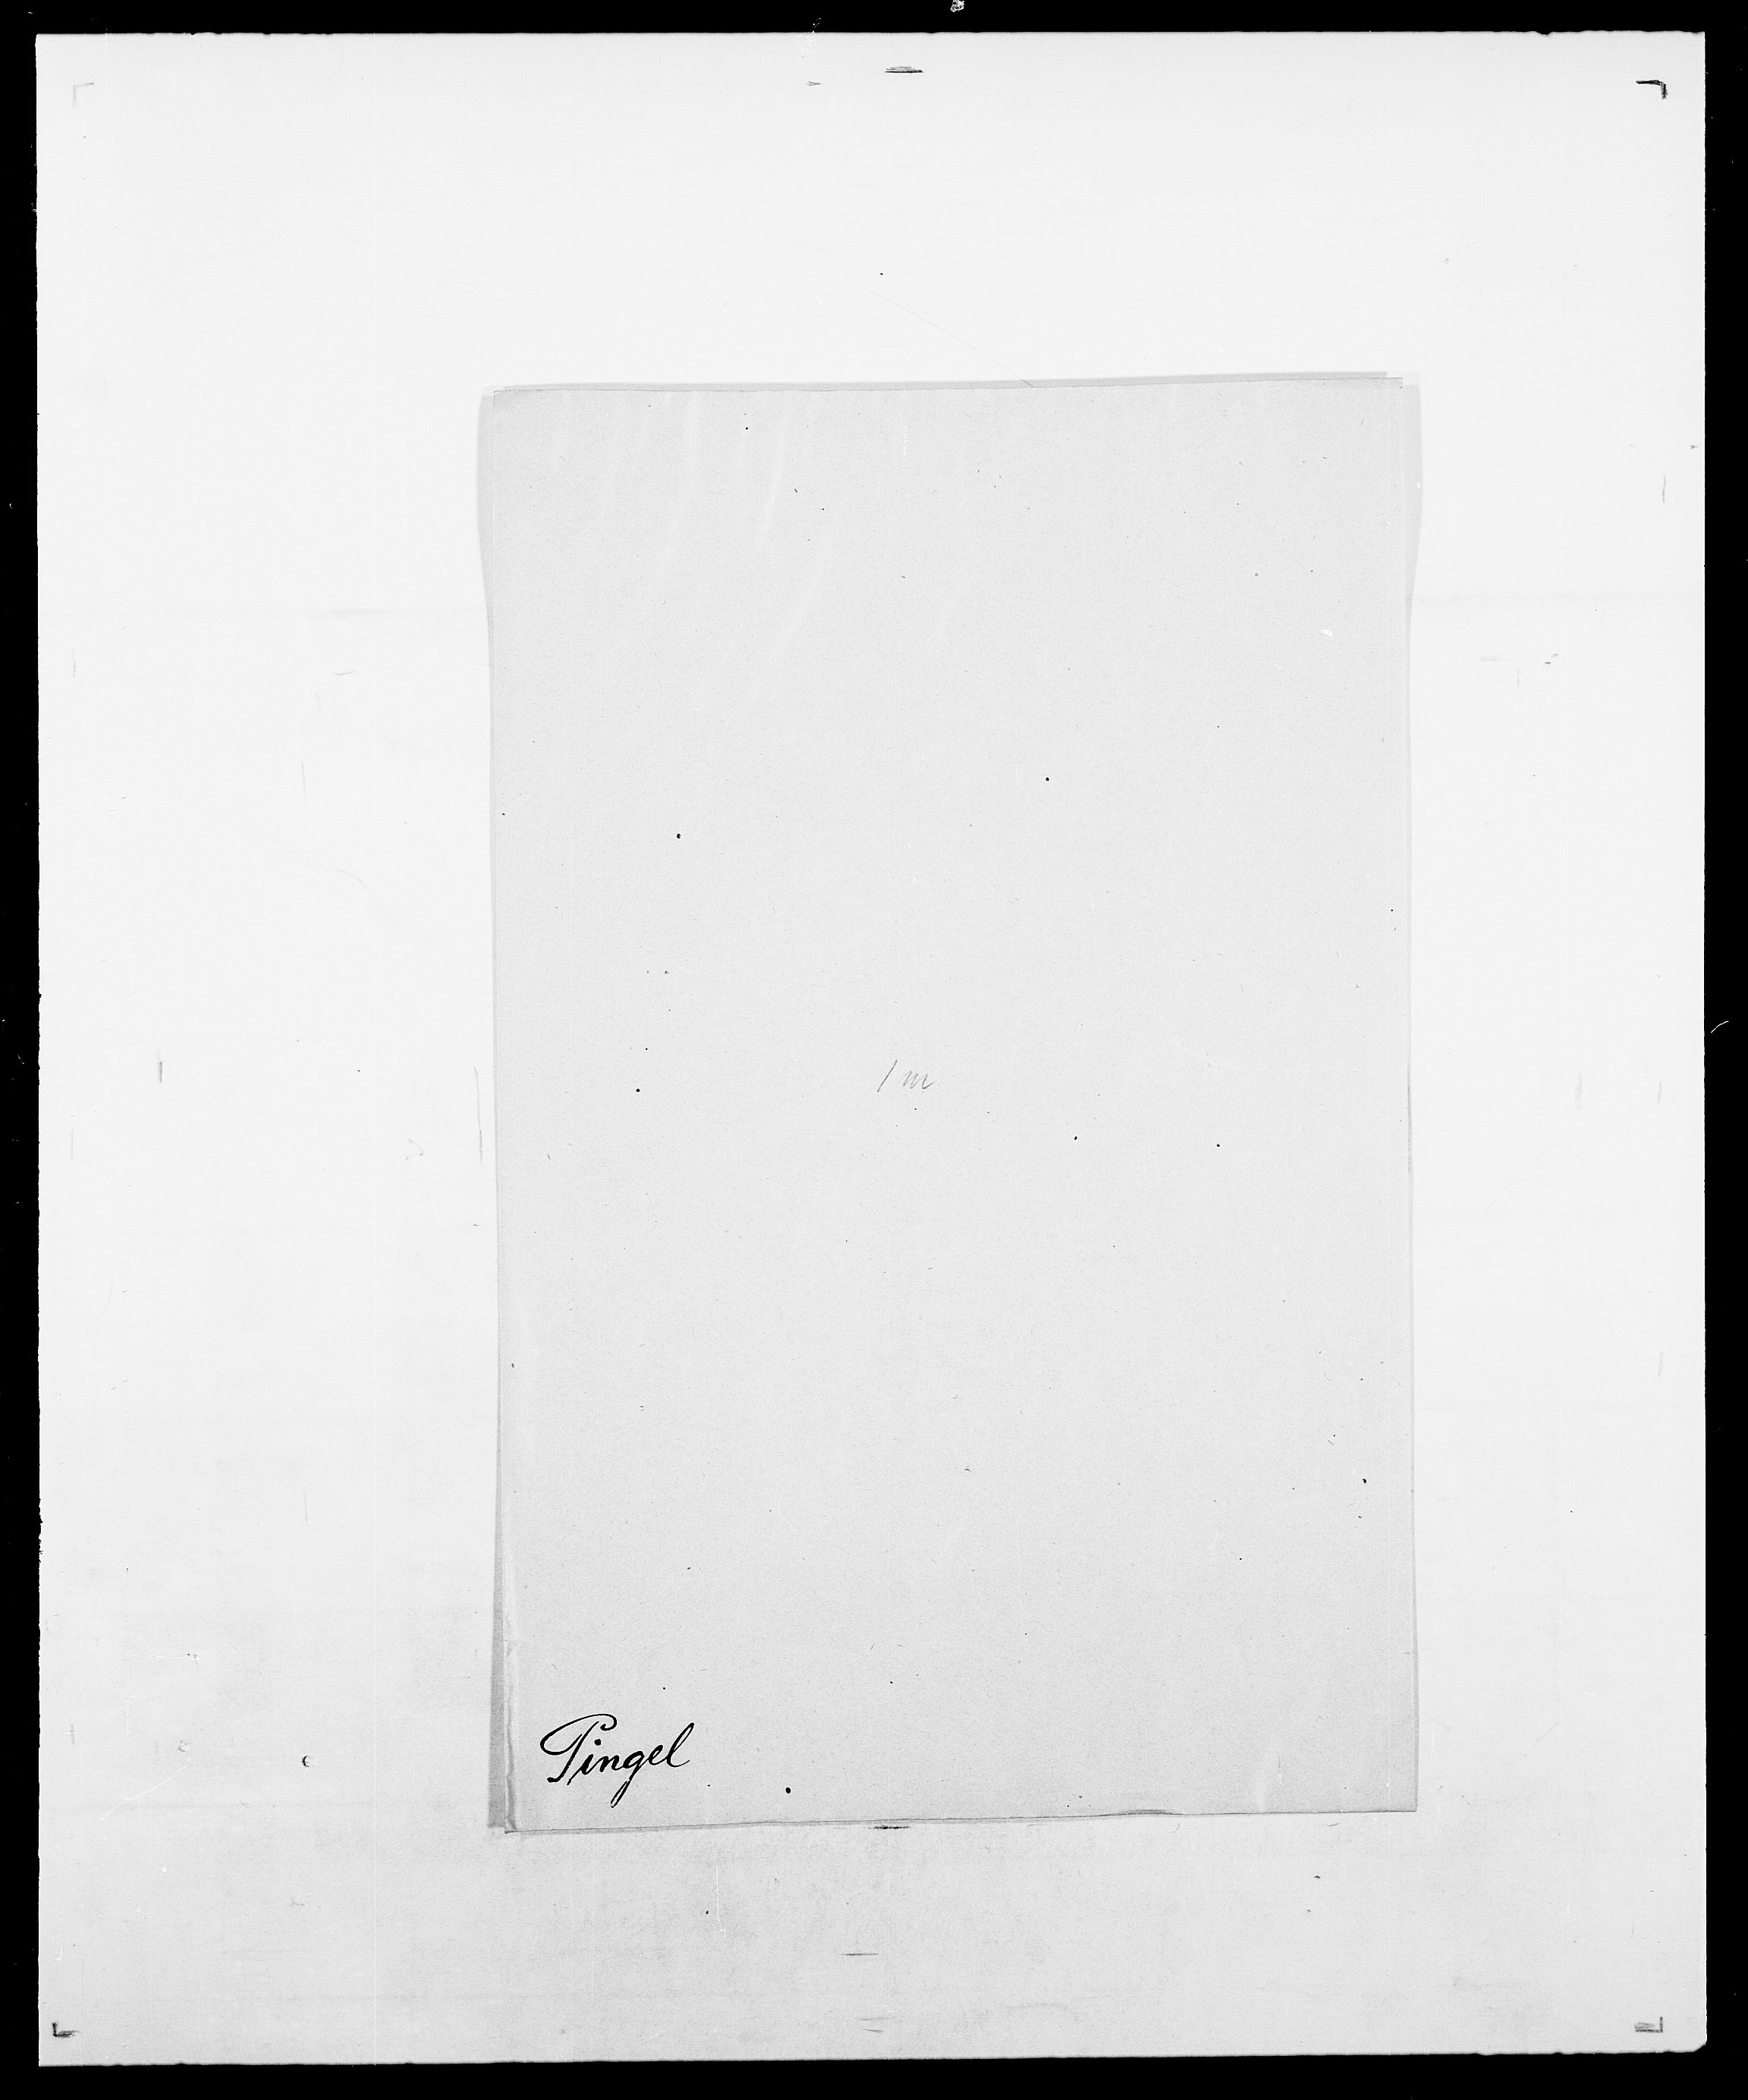 SAO, Delgobe, Charles Antoine - samling, D/Da/L0030: Paars - Pittelkov, s. 554